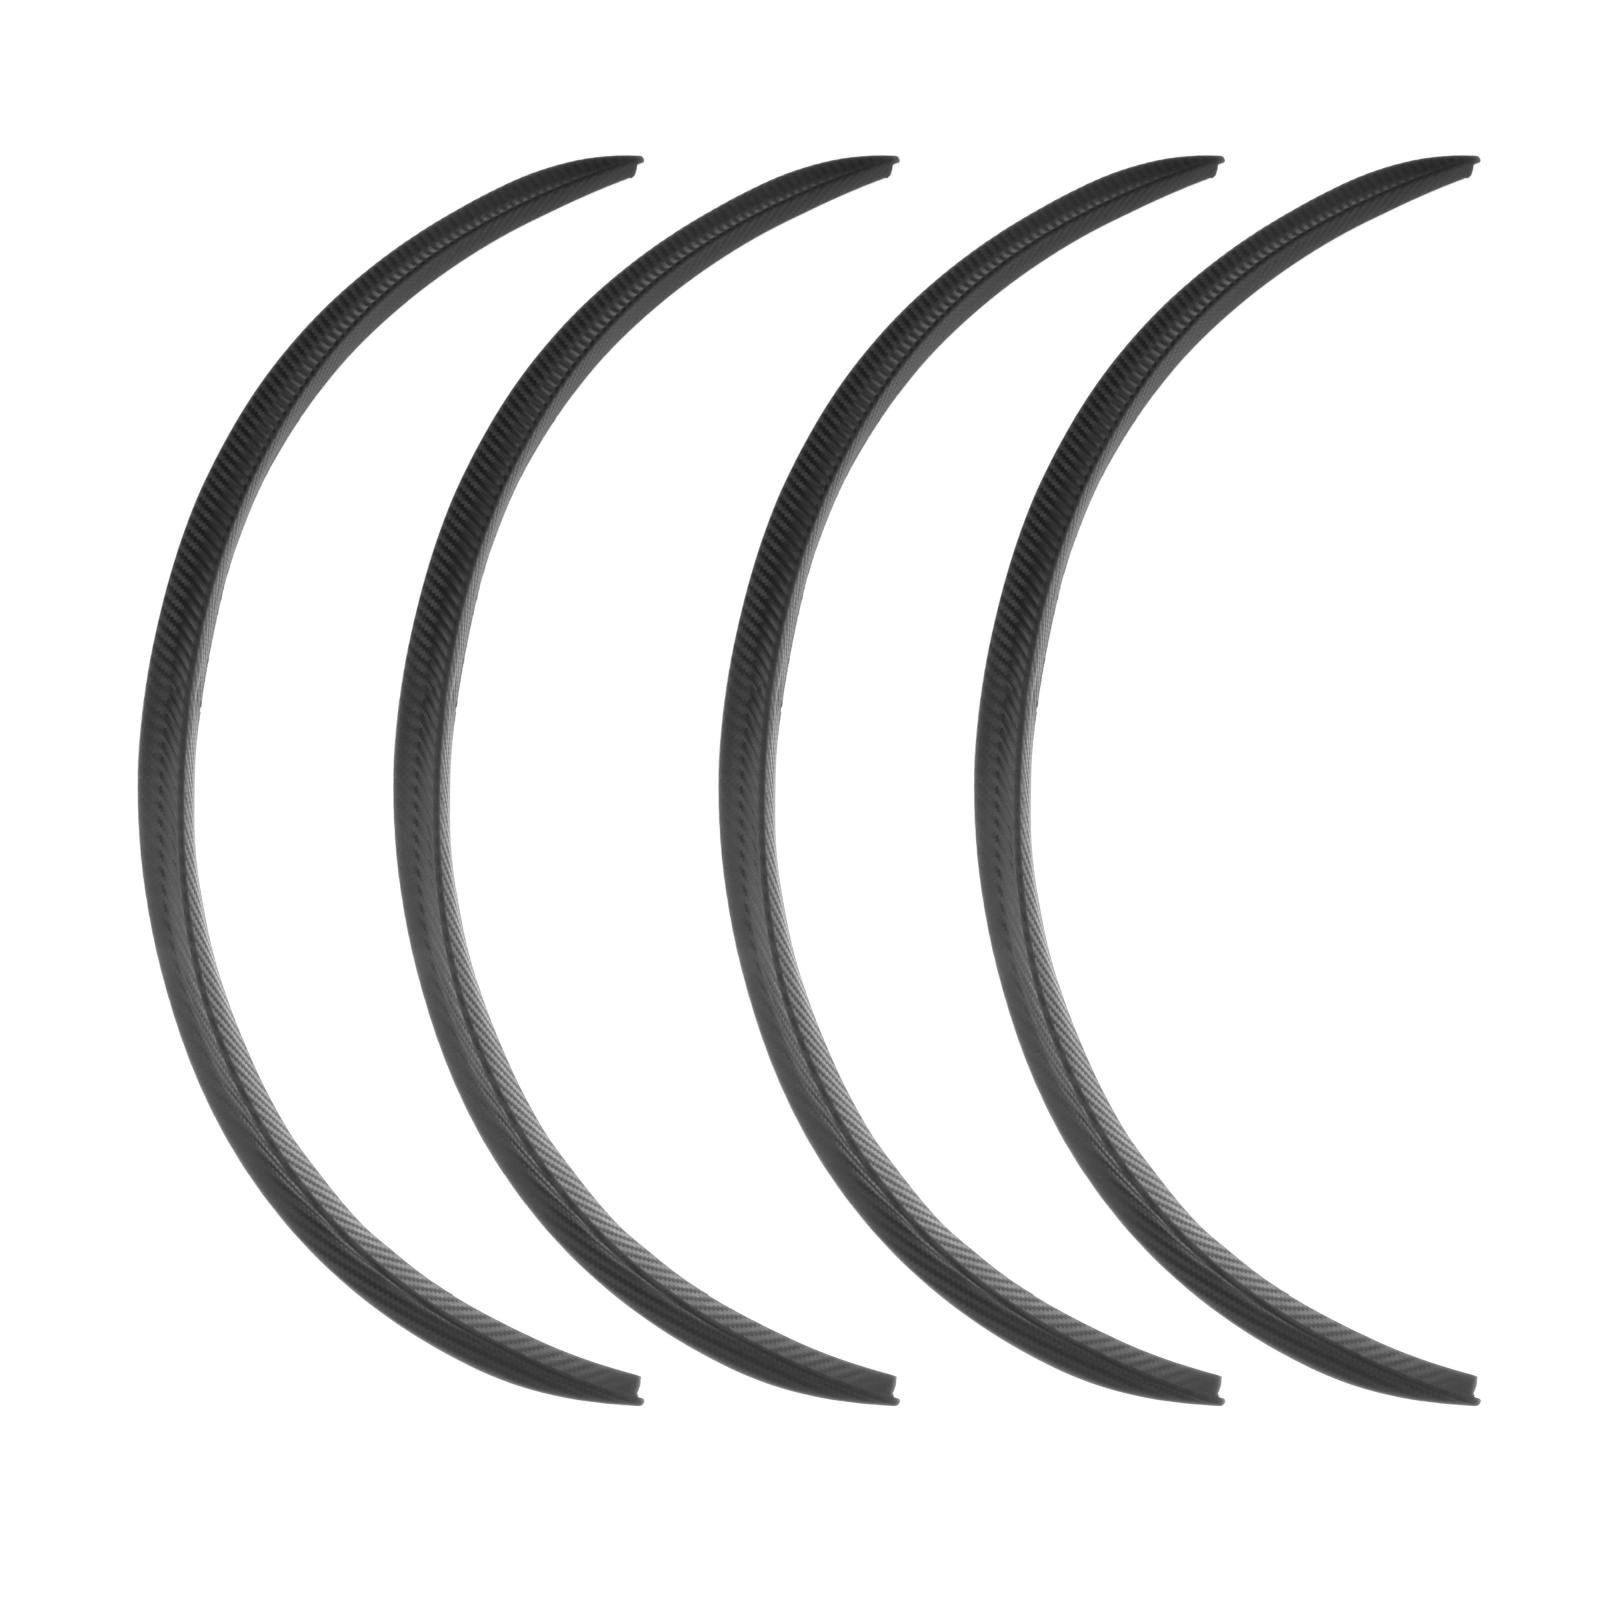 Car Wheel  Universal Auto Arch Guard Flexible Extension Eyebrow Trim Rubber Protector Black